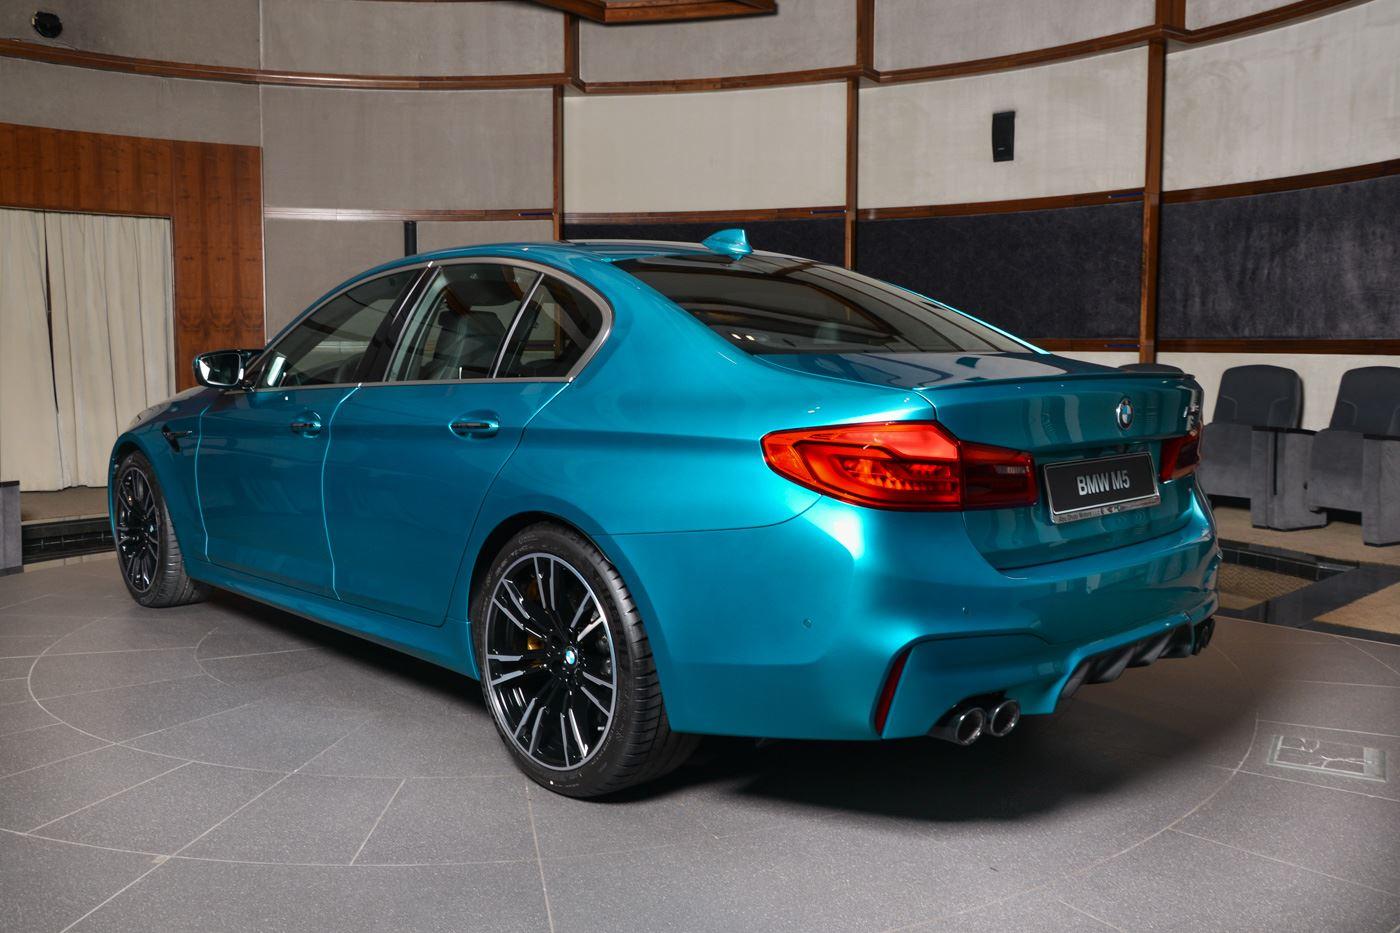 BMW_M5_Snapper_Rocks_Blue_0016